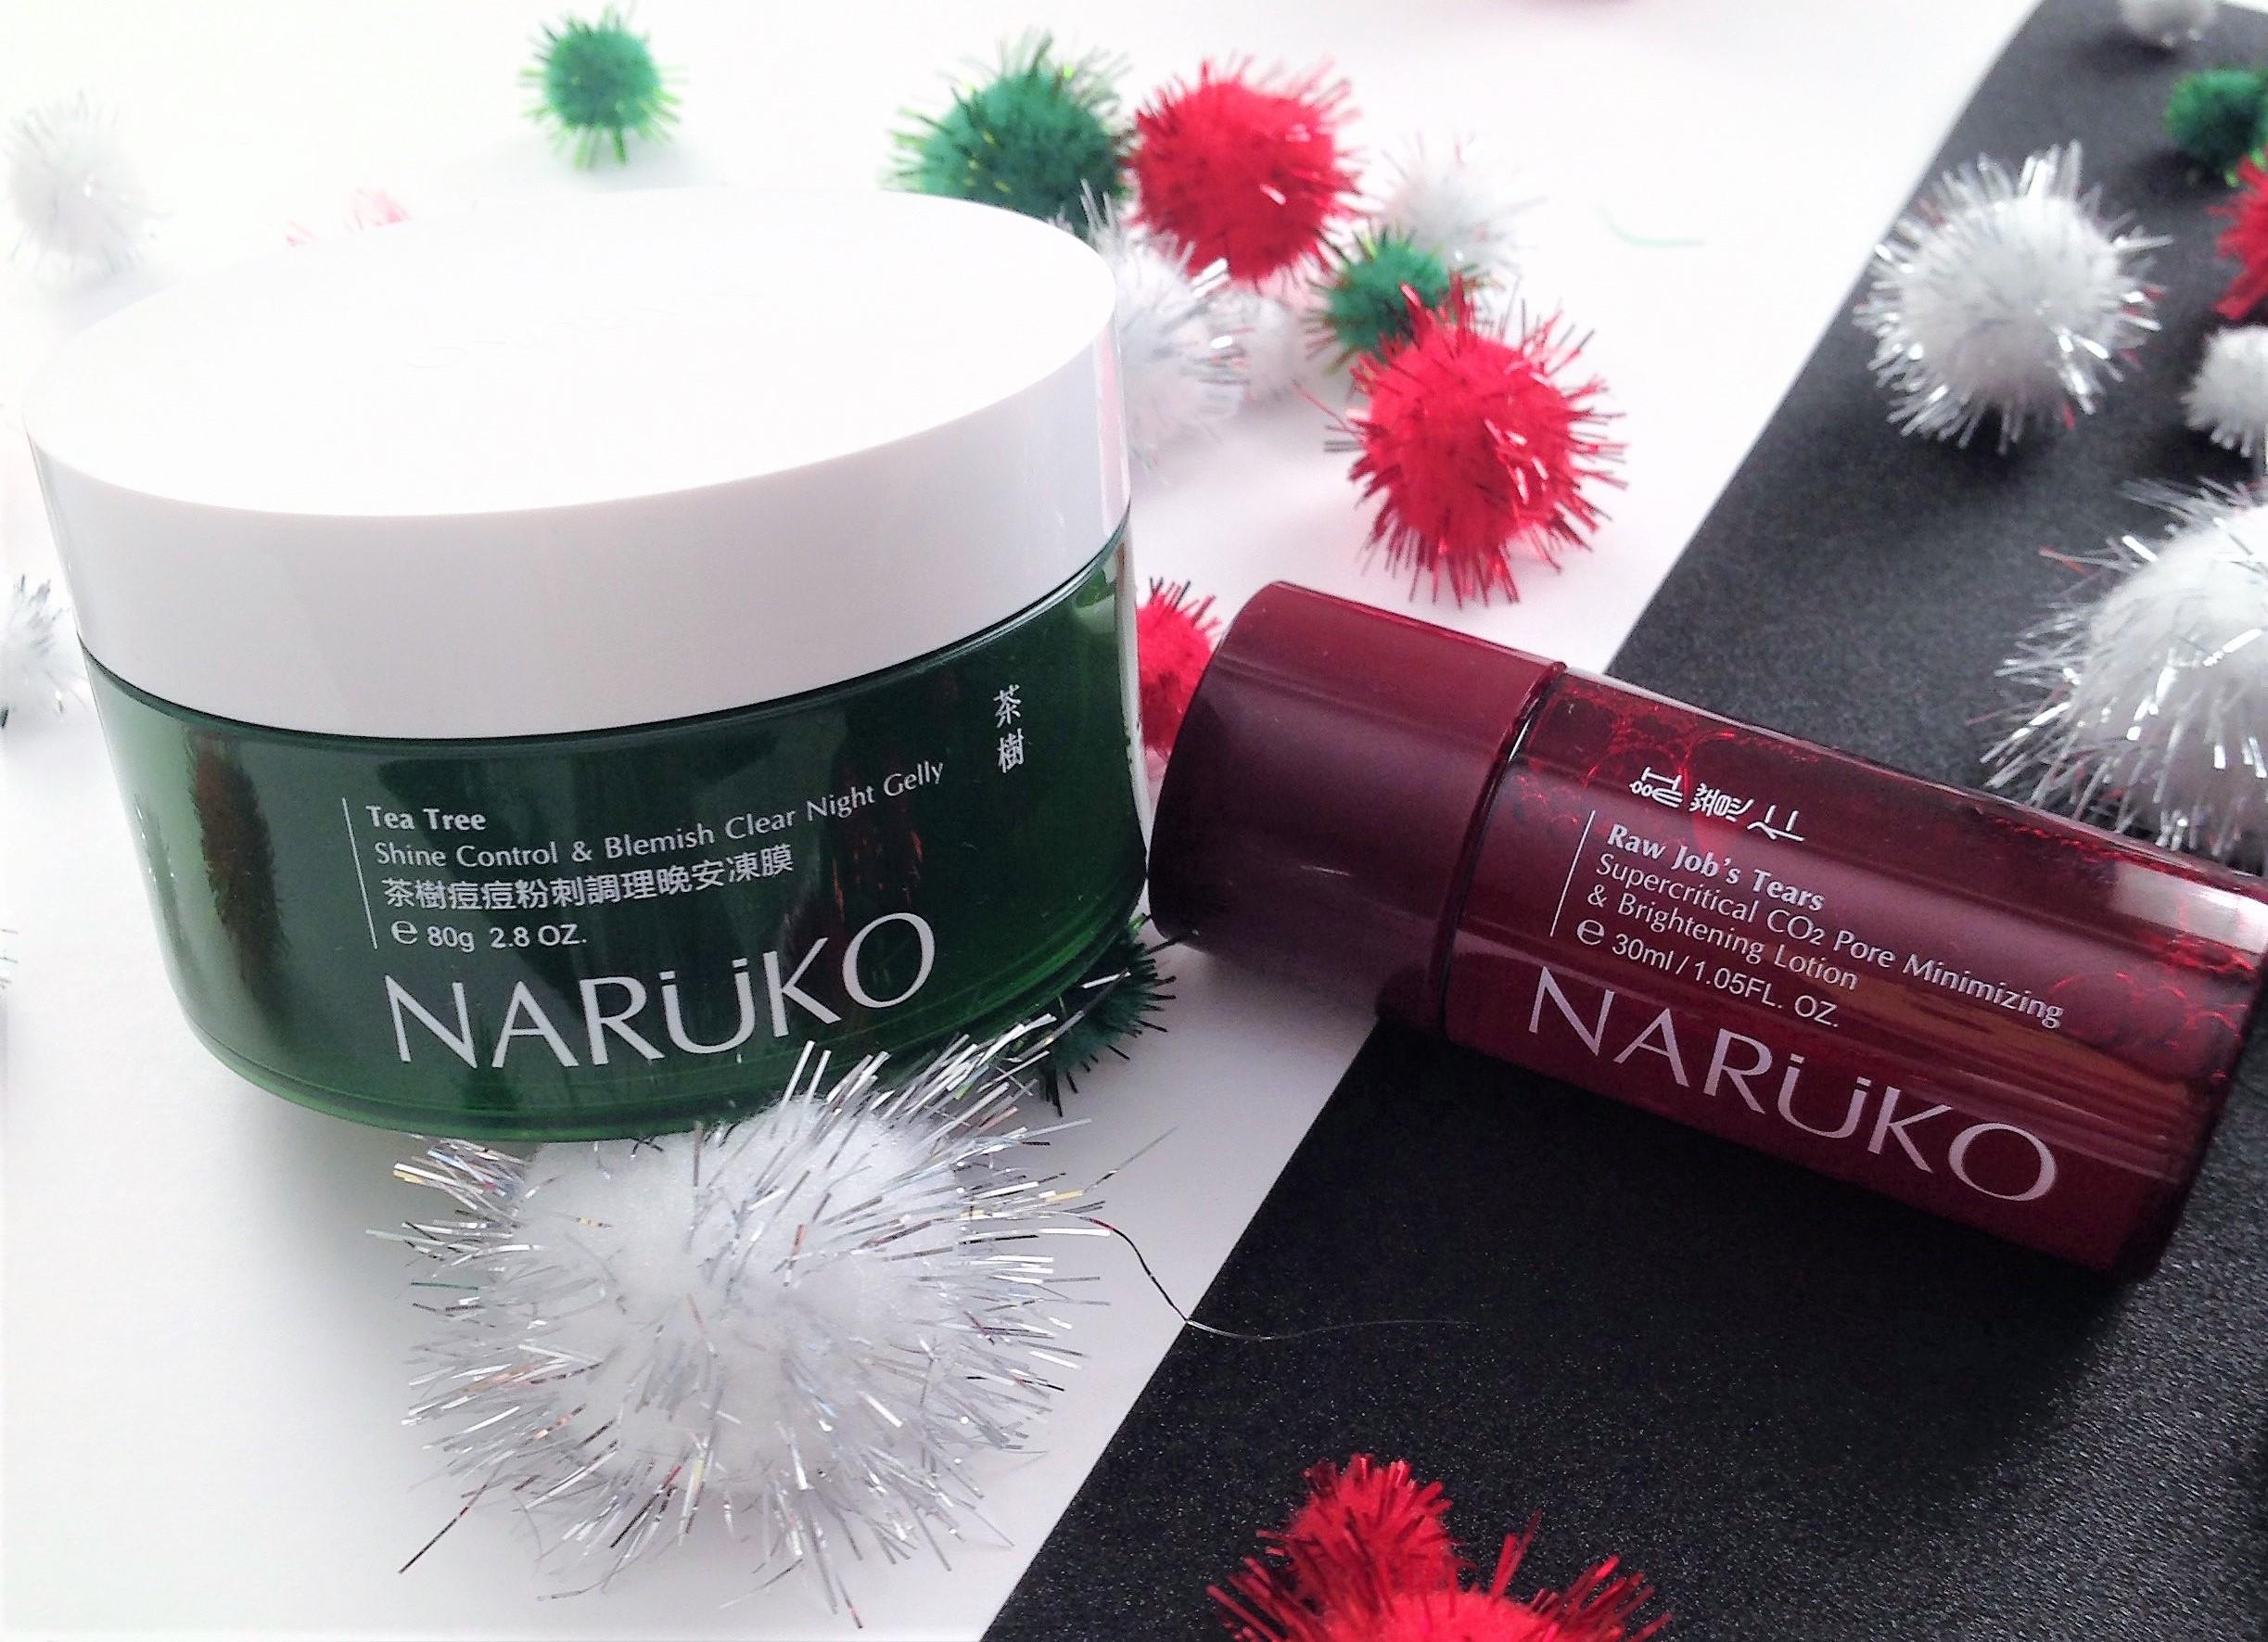 Naruko Raw Job S Tears Lotion And Tea Tree Night Gelly Reviewed